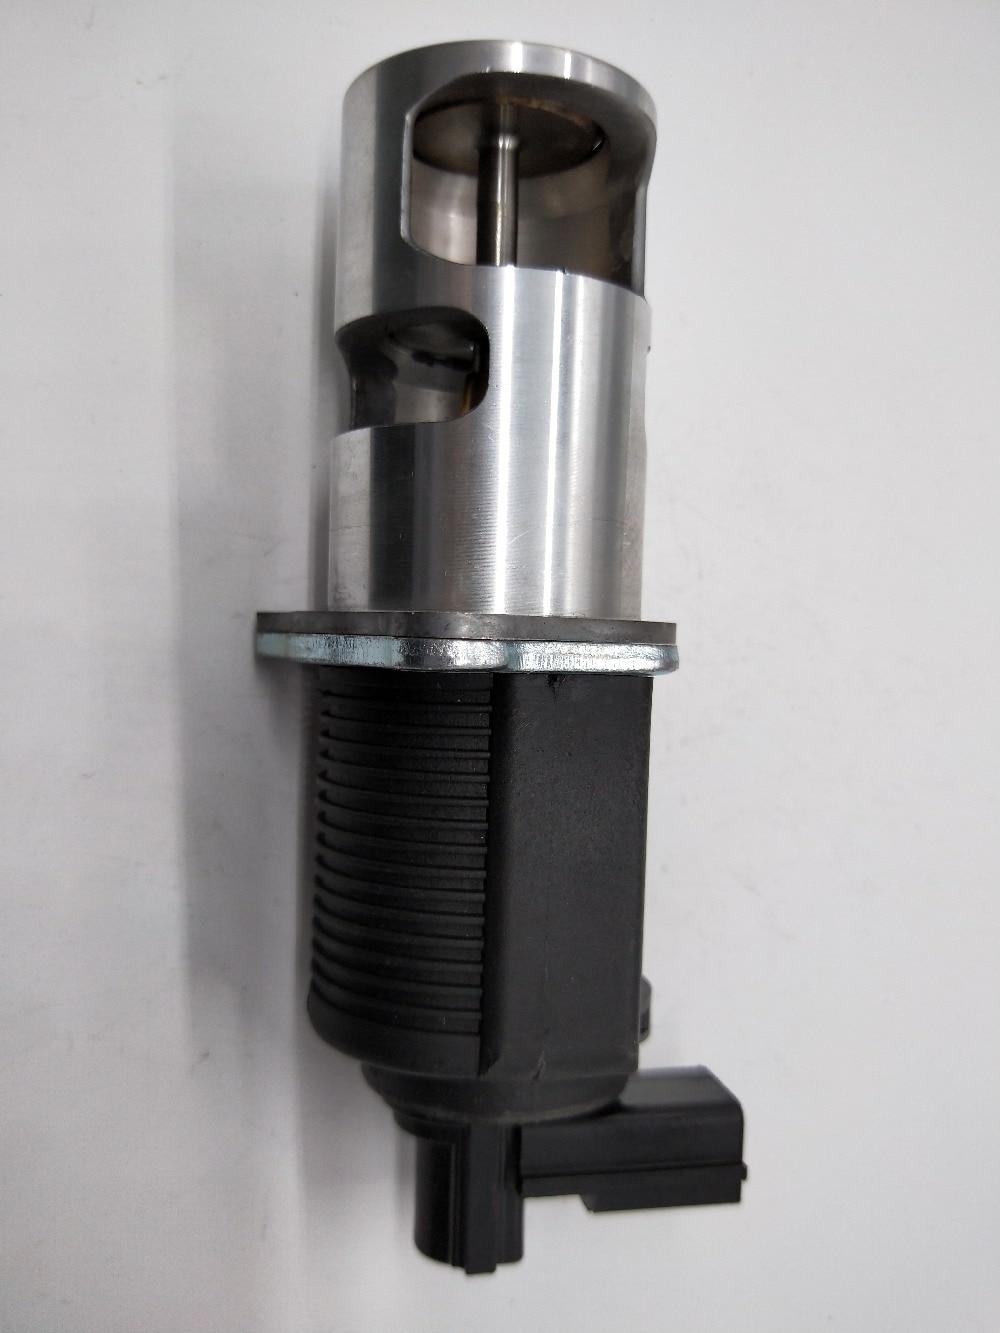 aliexpress com buy egr valve for dacia logan sandero nissan kubistar micra suzuki jimny renault clio grand scenic kangoo megane modus thalia 1 5 from  [ 1000 x 1333 Pixel ]